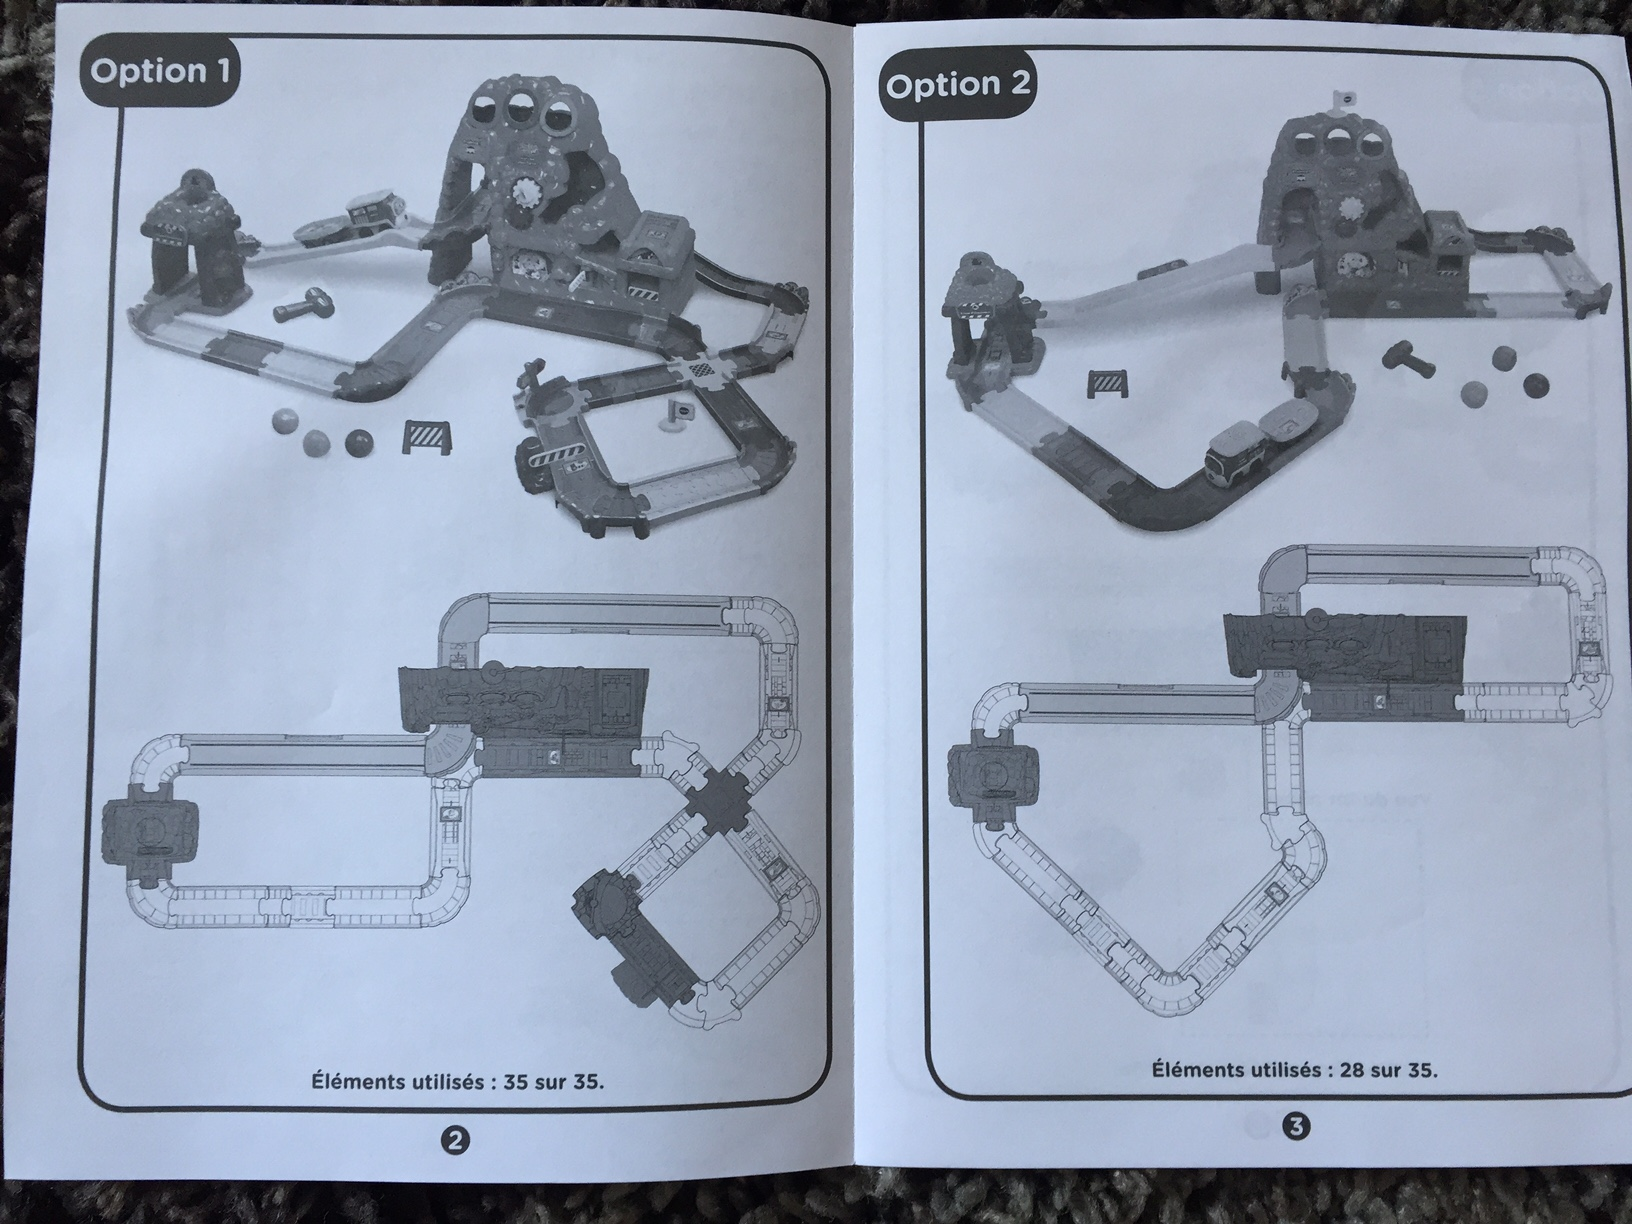 maman puissance 4 tchou tchou bolides circuit canyon. Black Bedroom Furniture Sets. Home Design Ideas